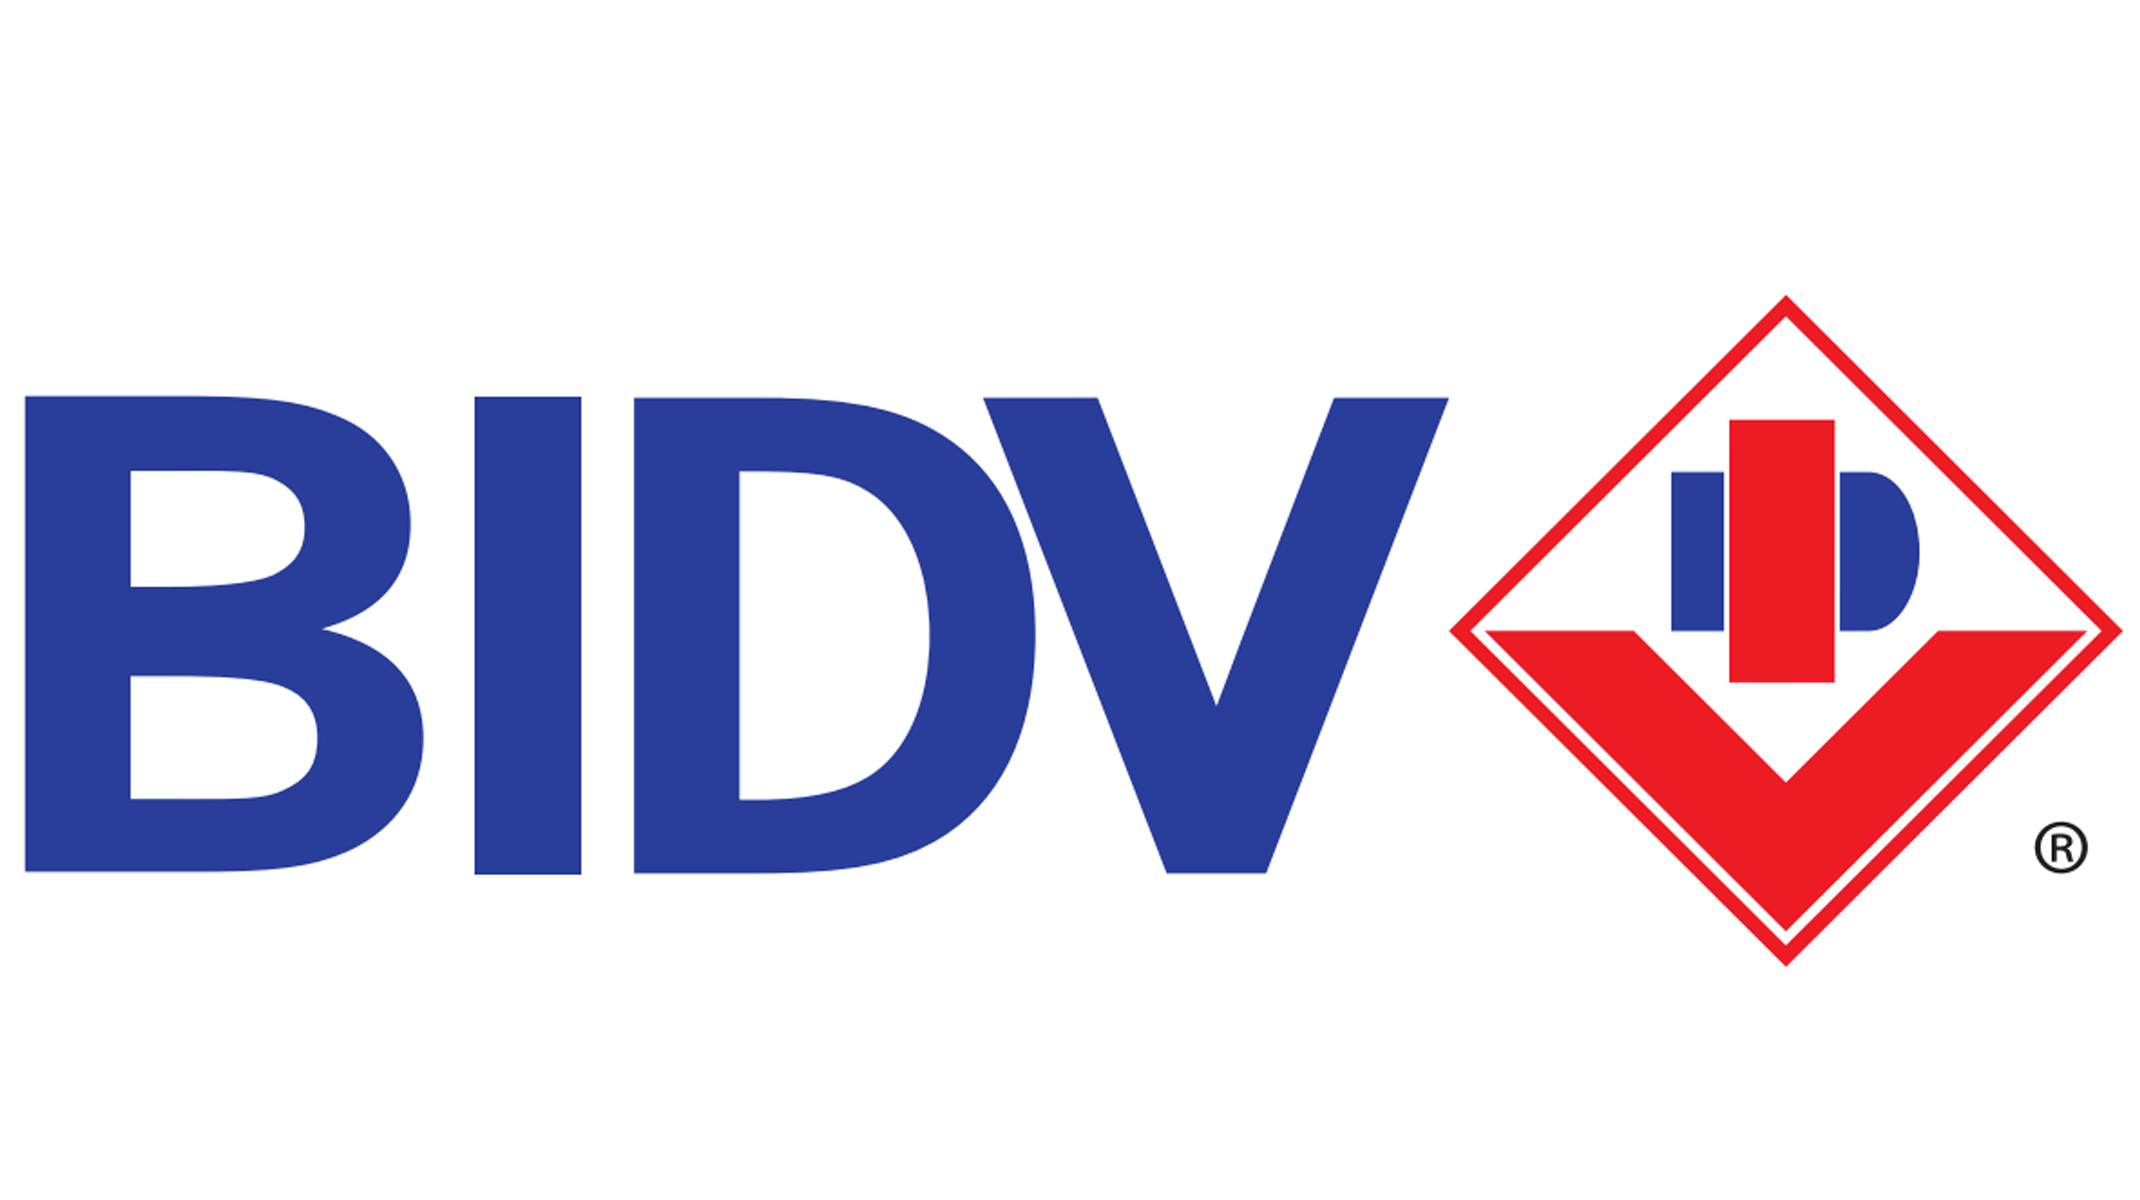 BIDV Logo photo - 1